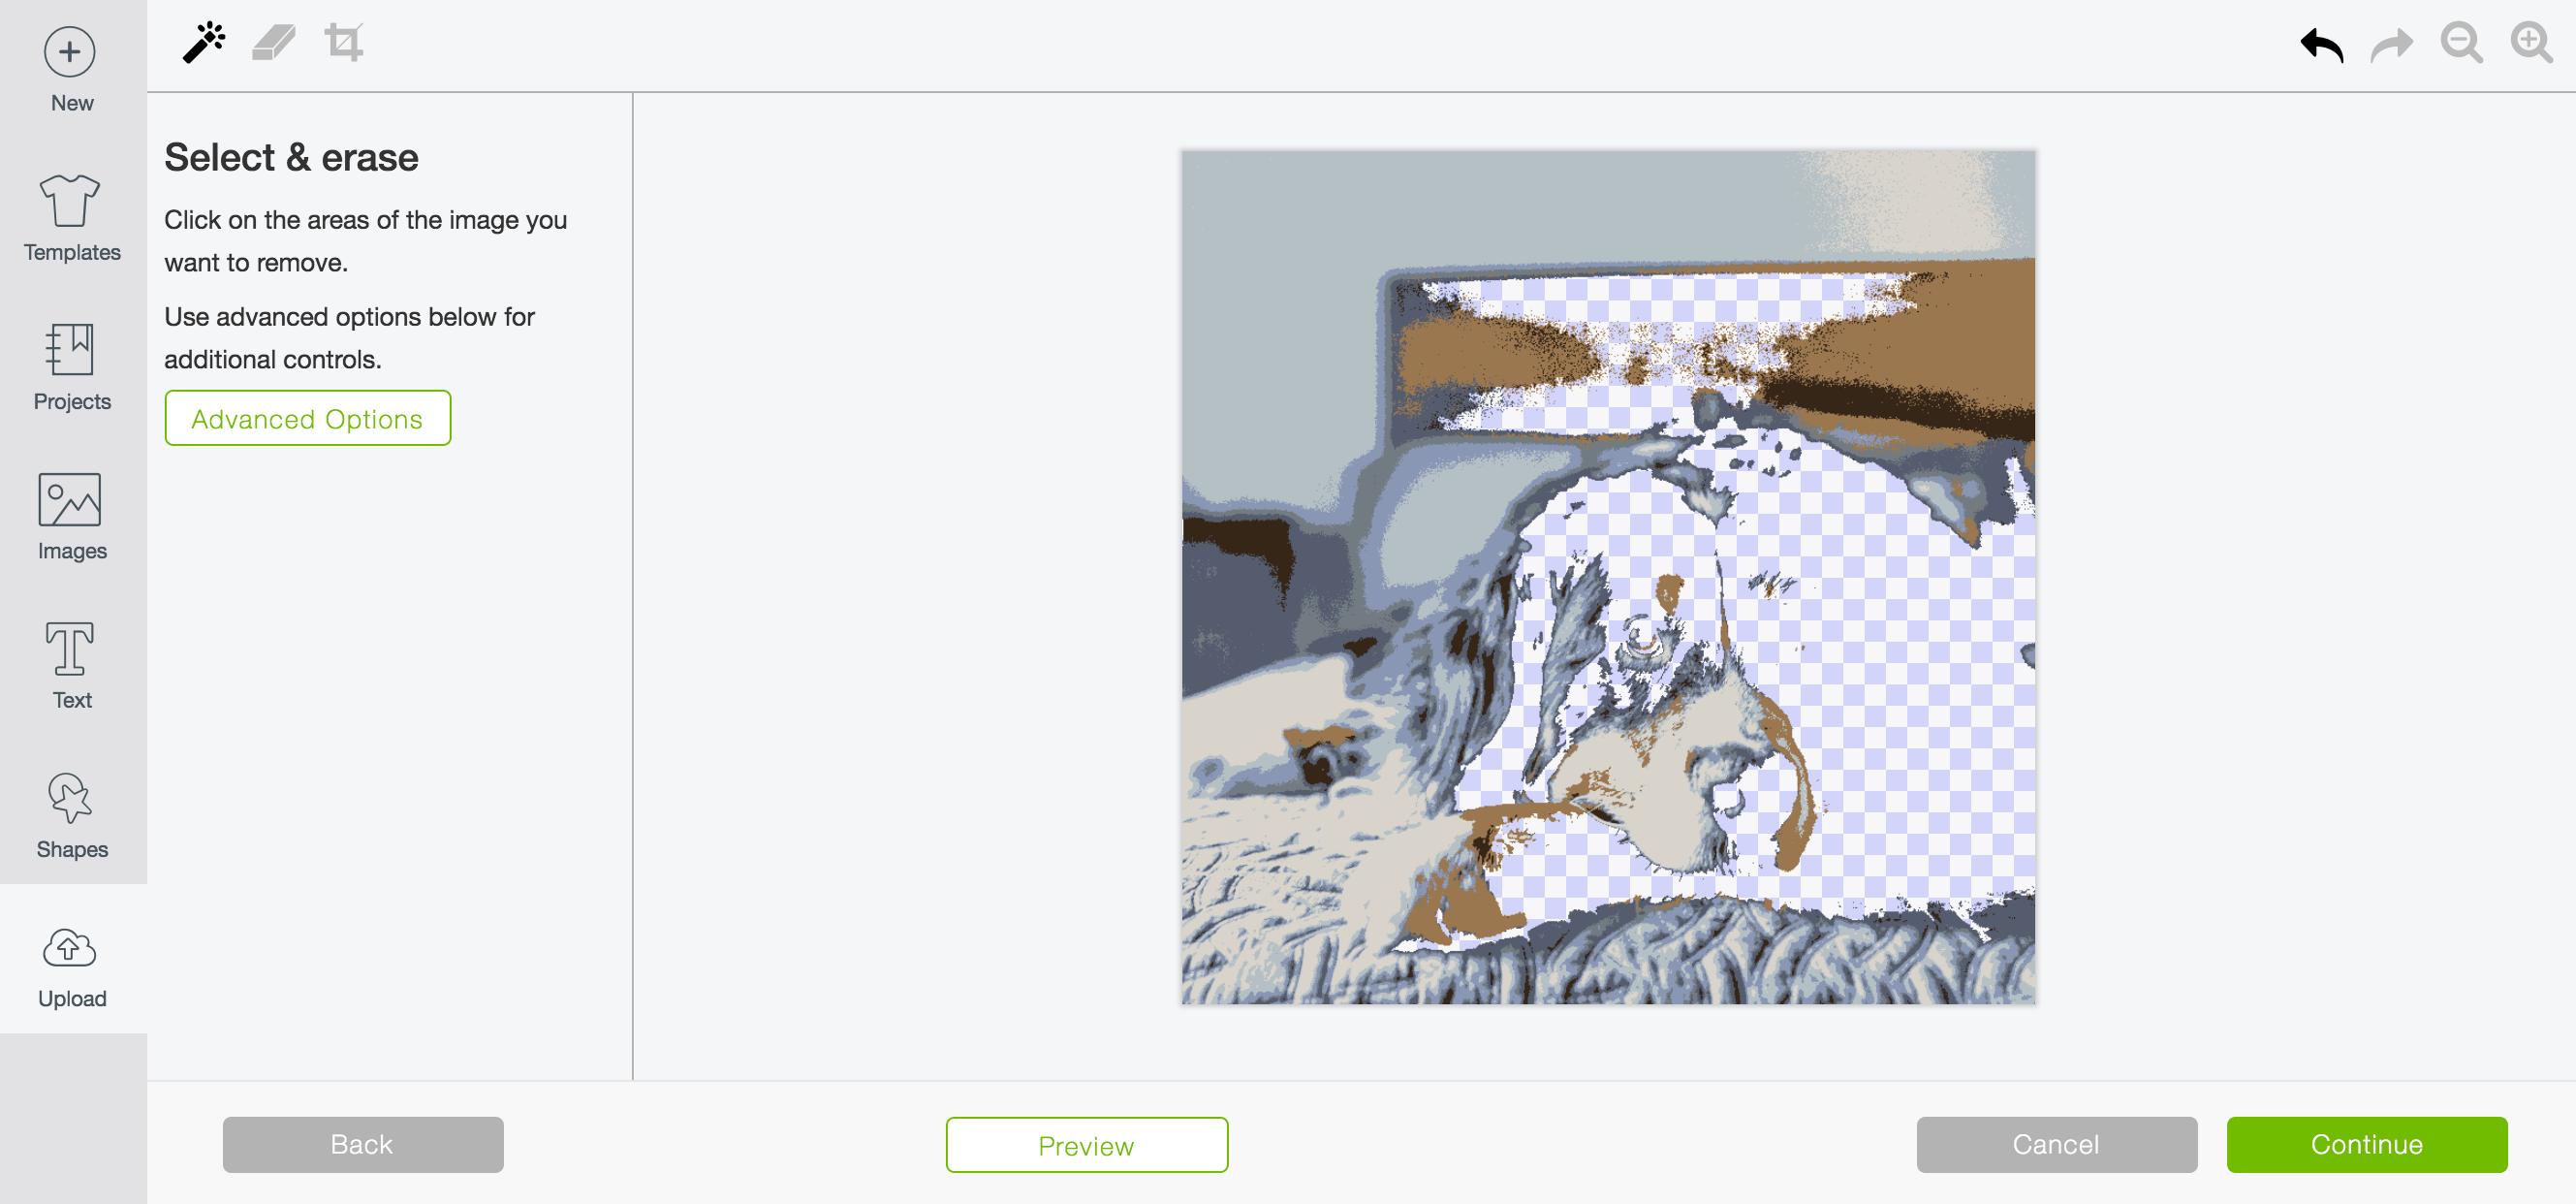 Select and erase Gunnar dog photo